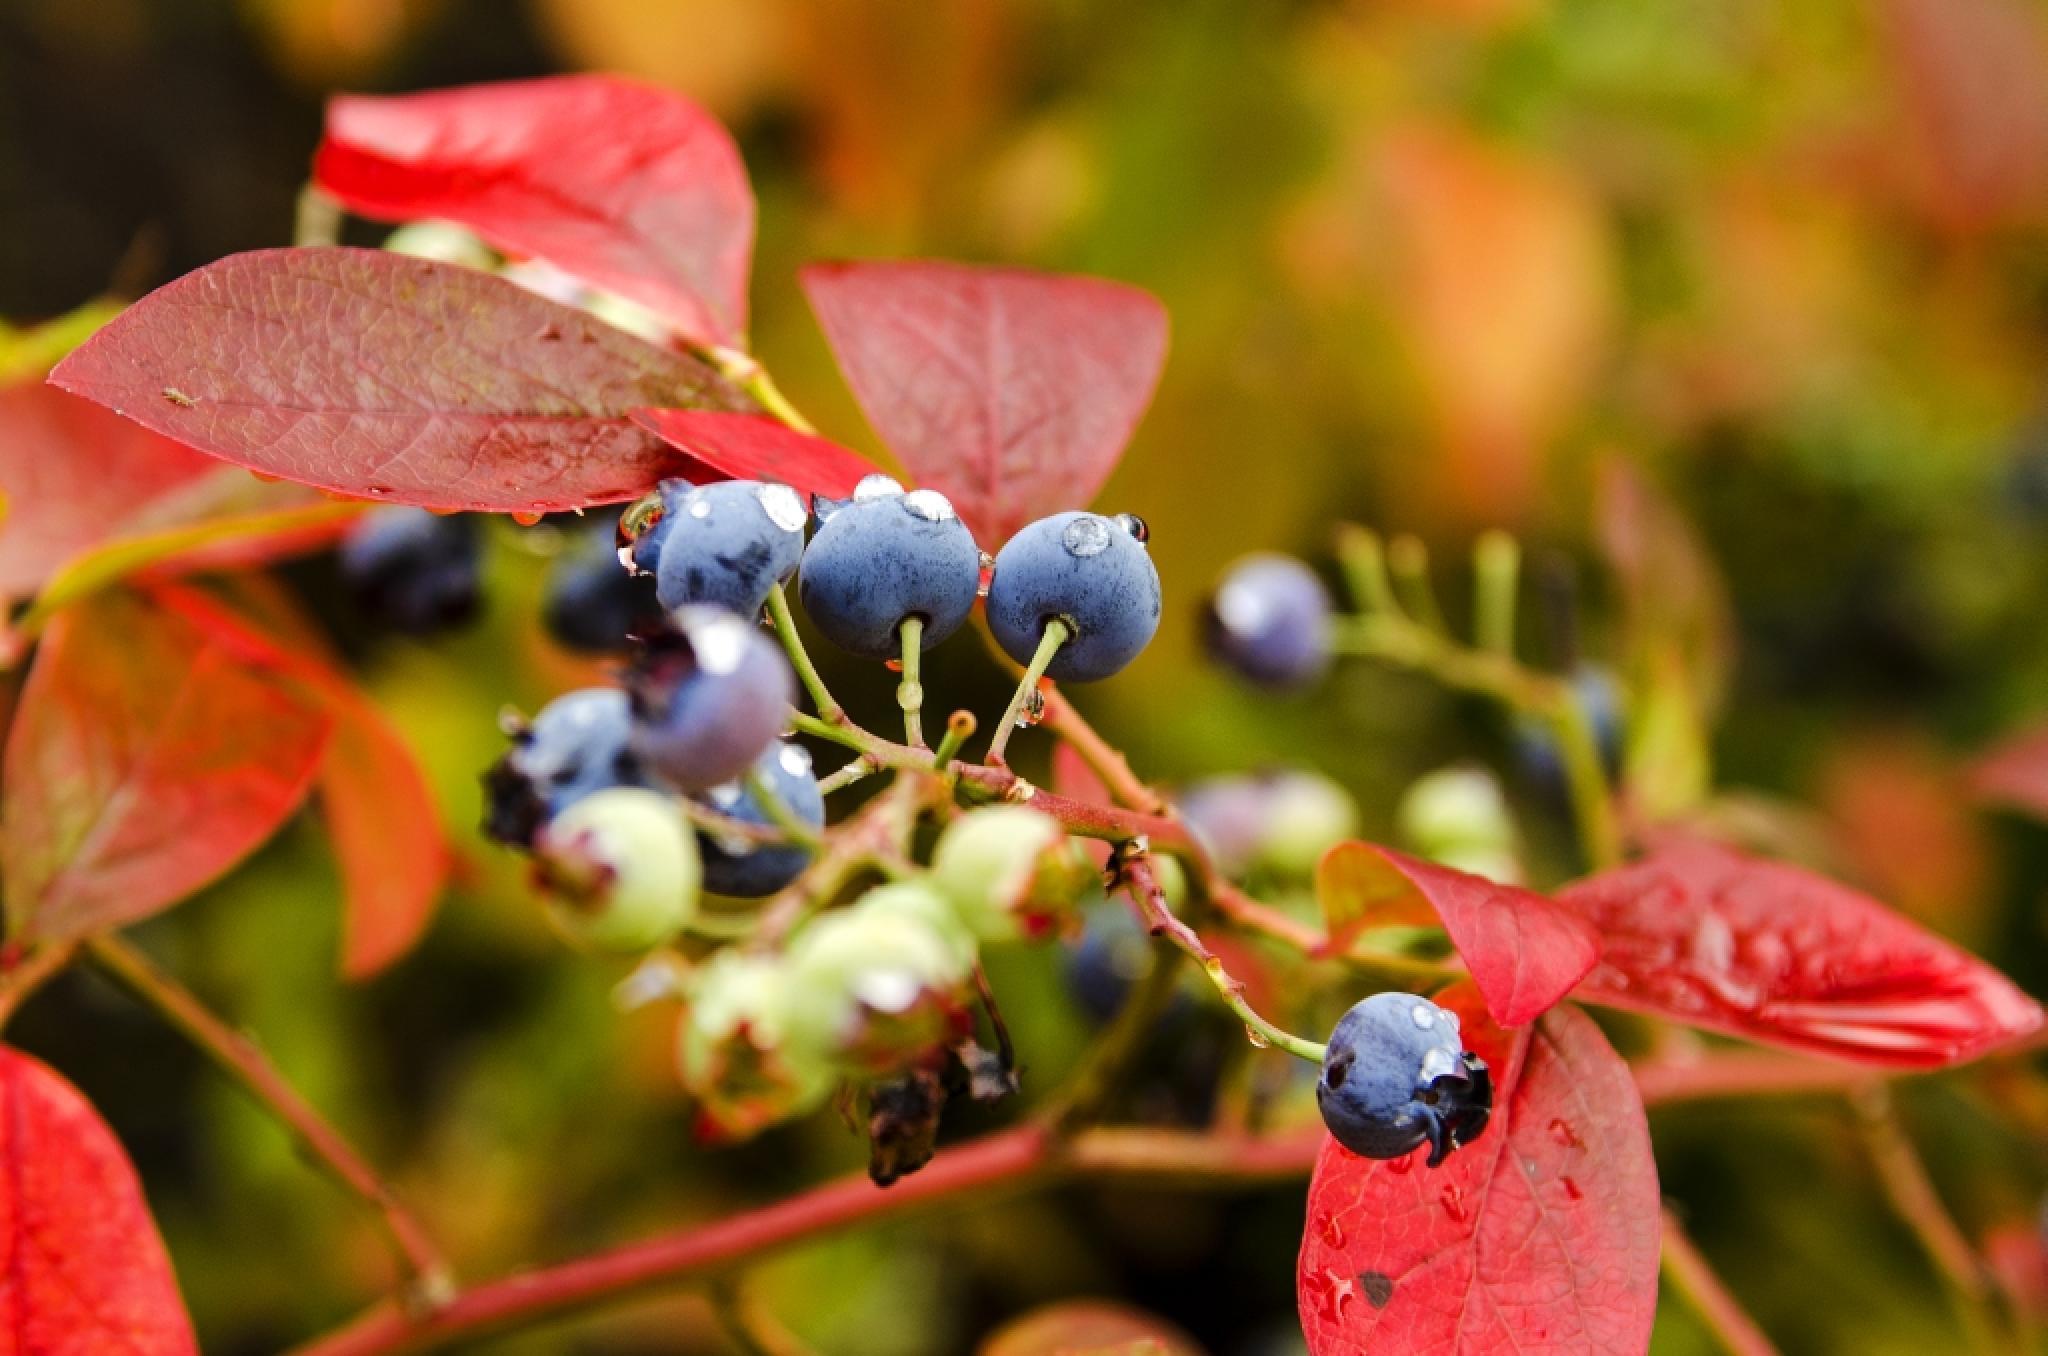 Blueberries by Iam Burn